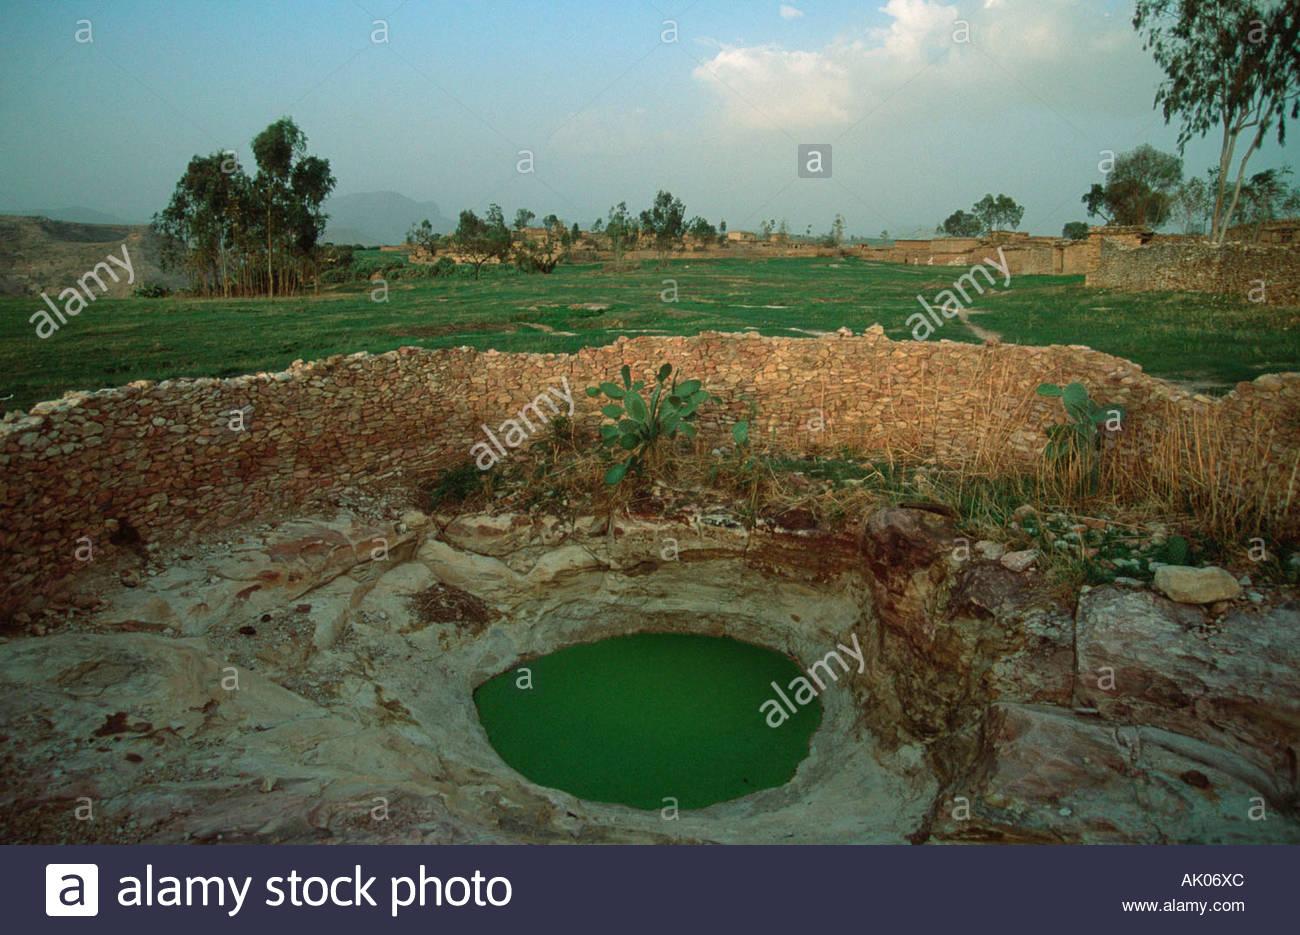 Water cistern / Bizet / Wasser-Zisterne - Stock Image